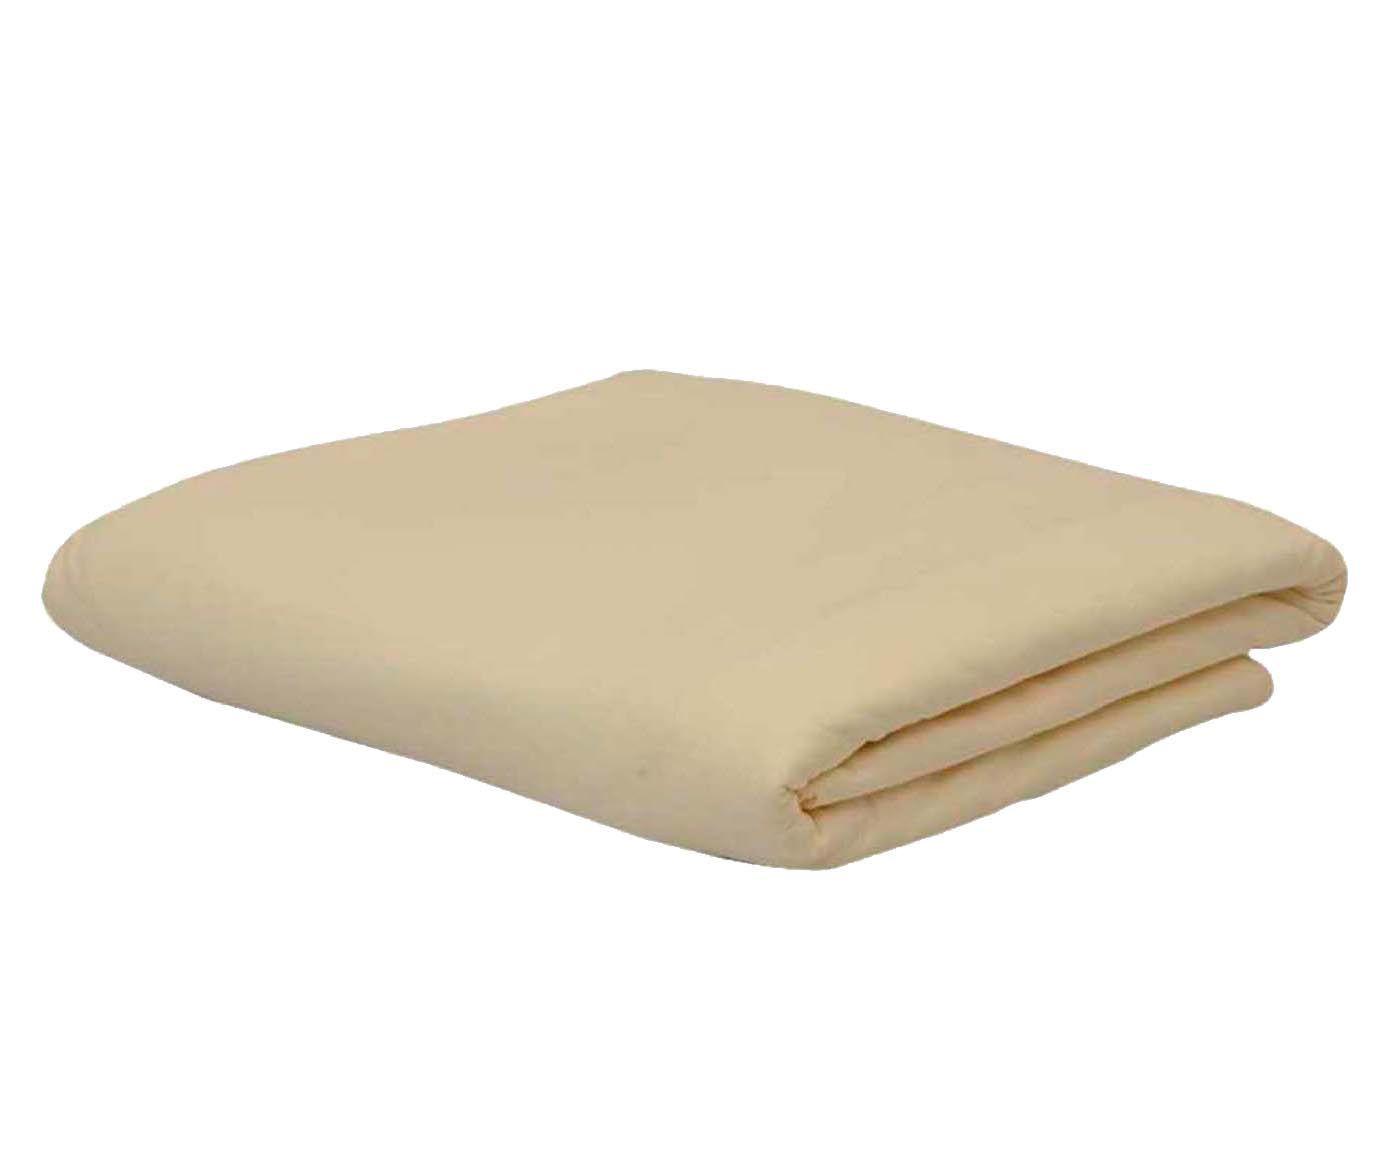 Lençol cosmos lana - para cama queen size   Westwing.com.br